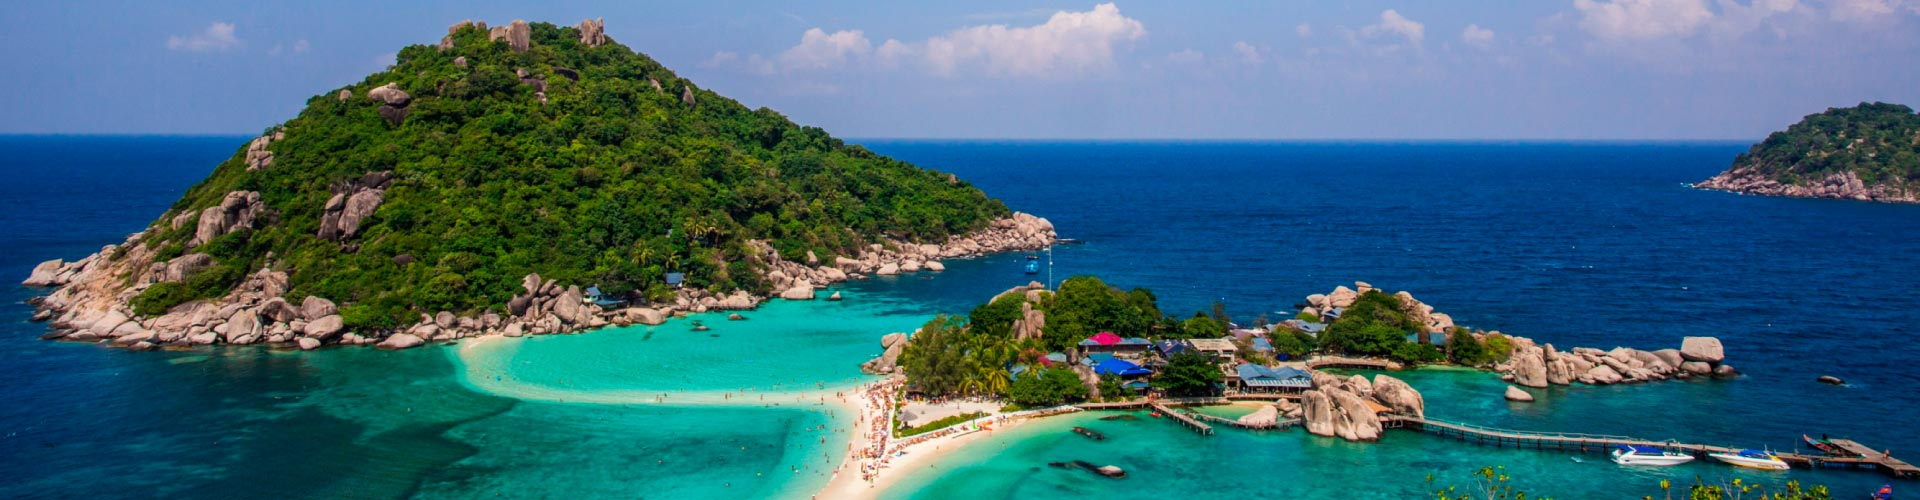 Laem Chabang - Koh Samui - Singapore (Costa Cruise)